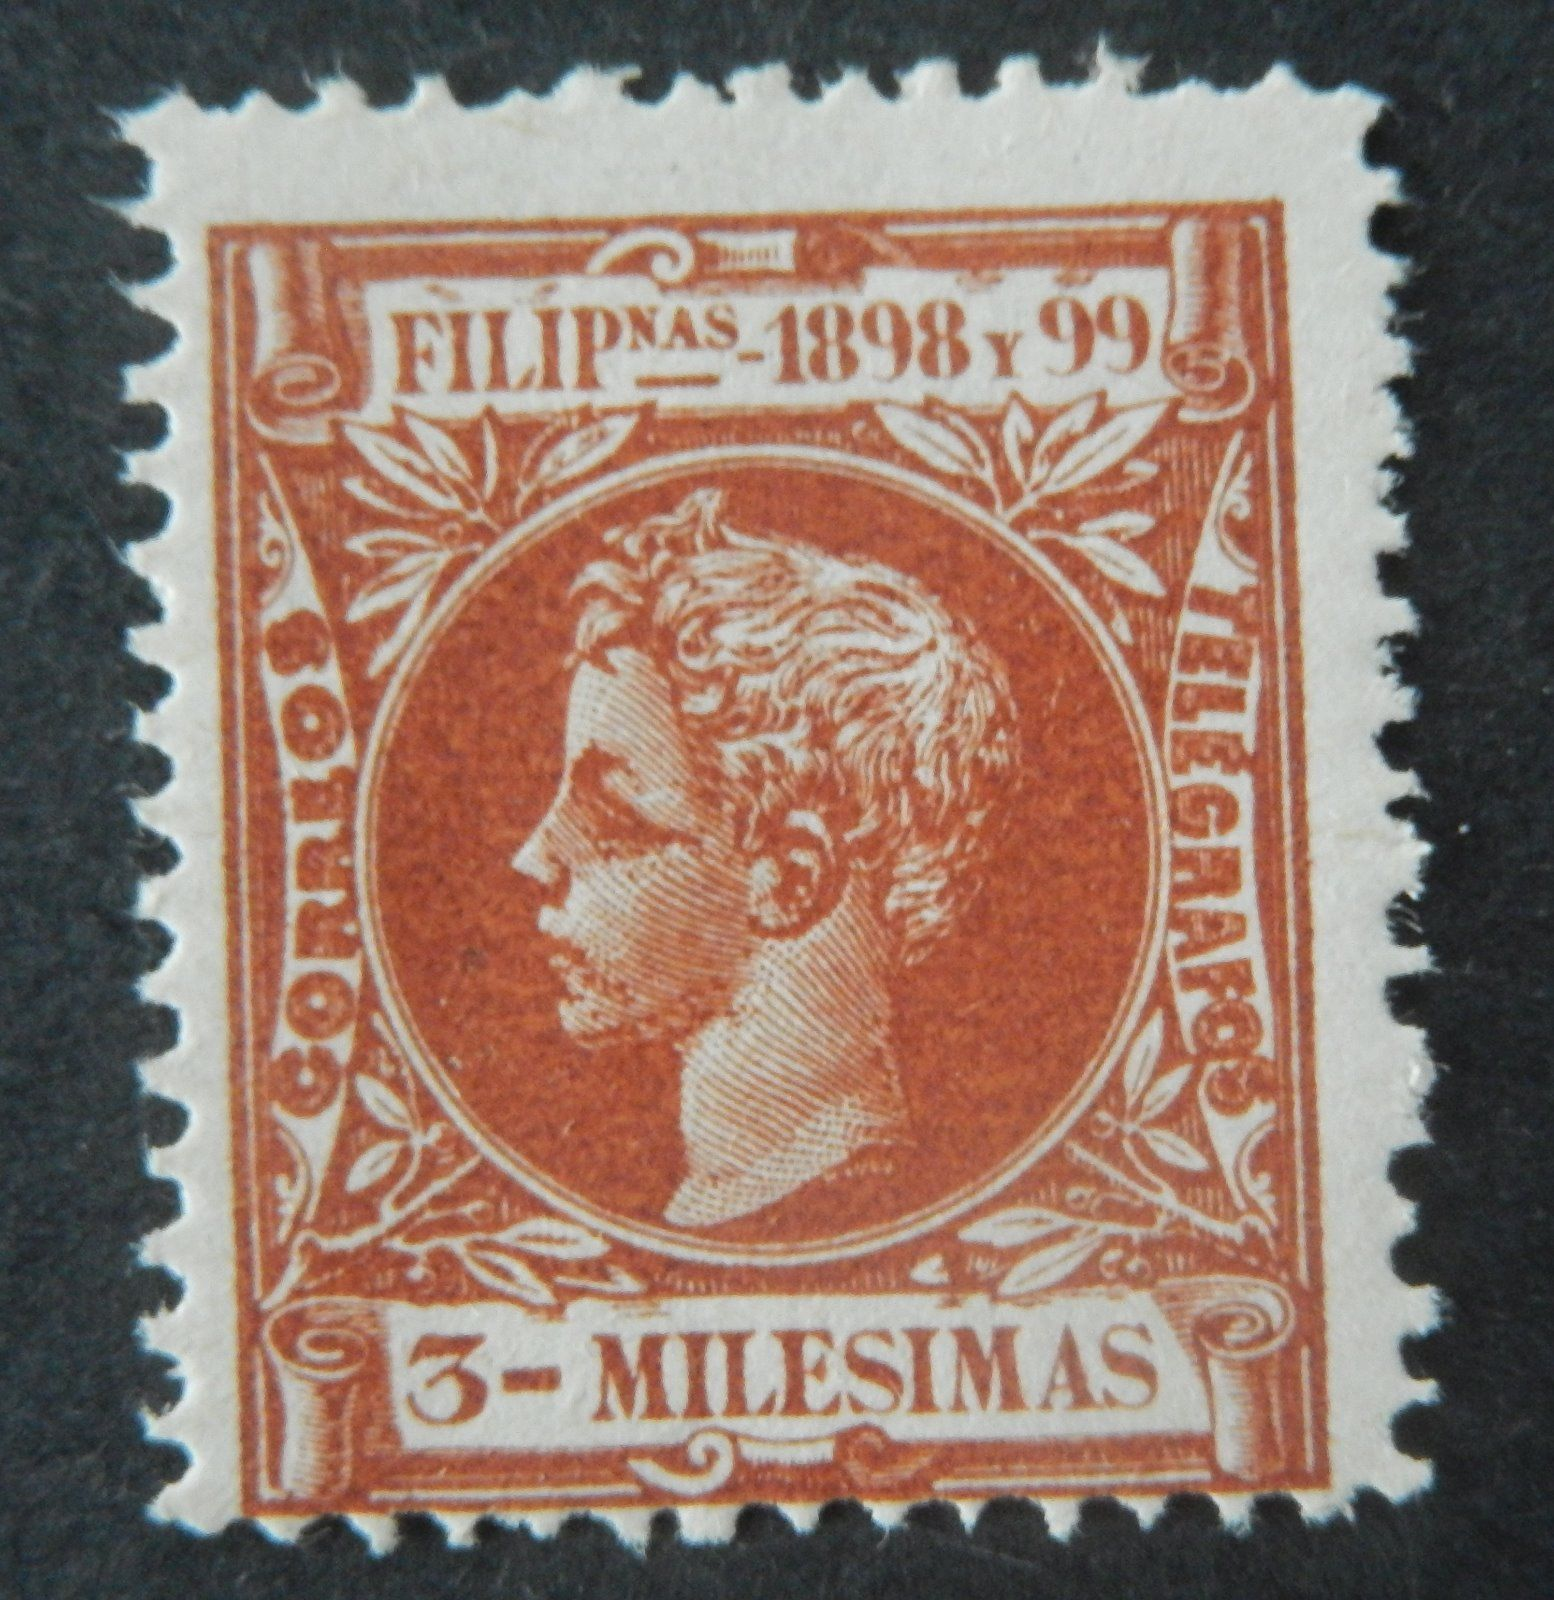 Philipppines Stamp Spanish Occupation 194 Mint Lightly Hinged Original Gum | eBay